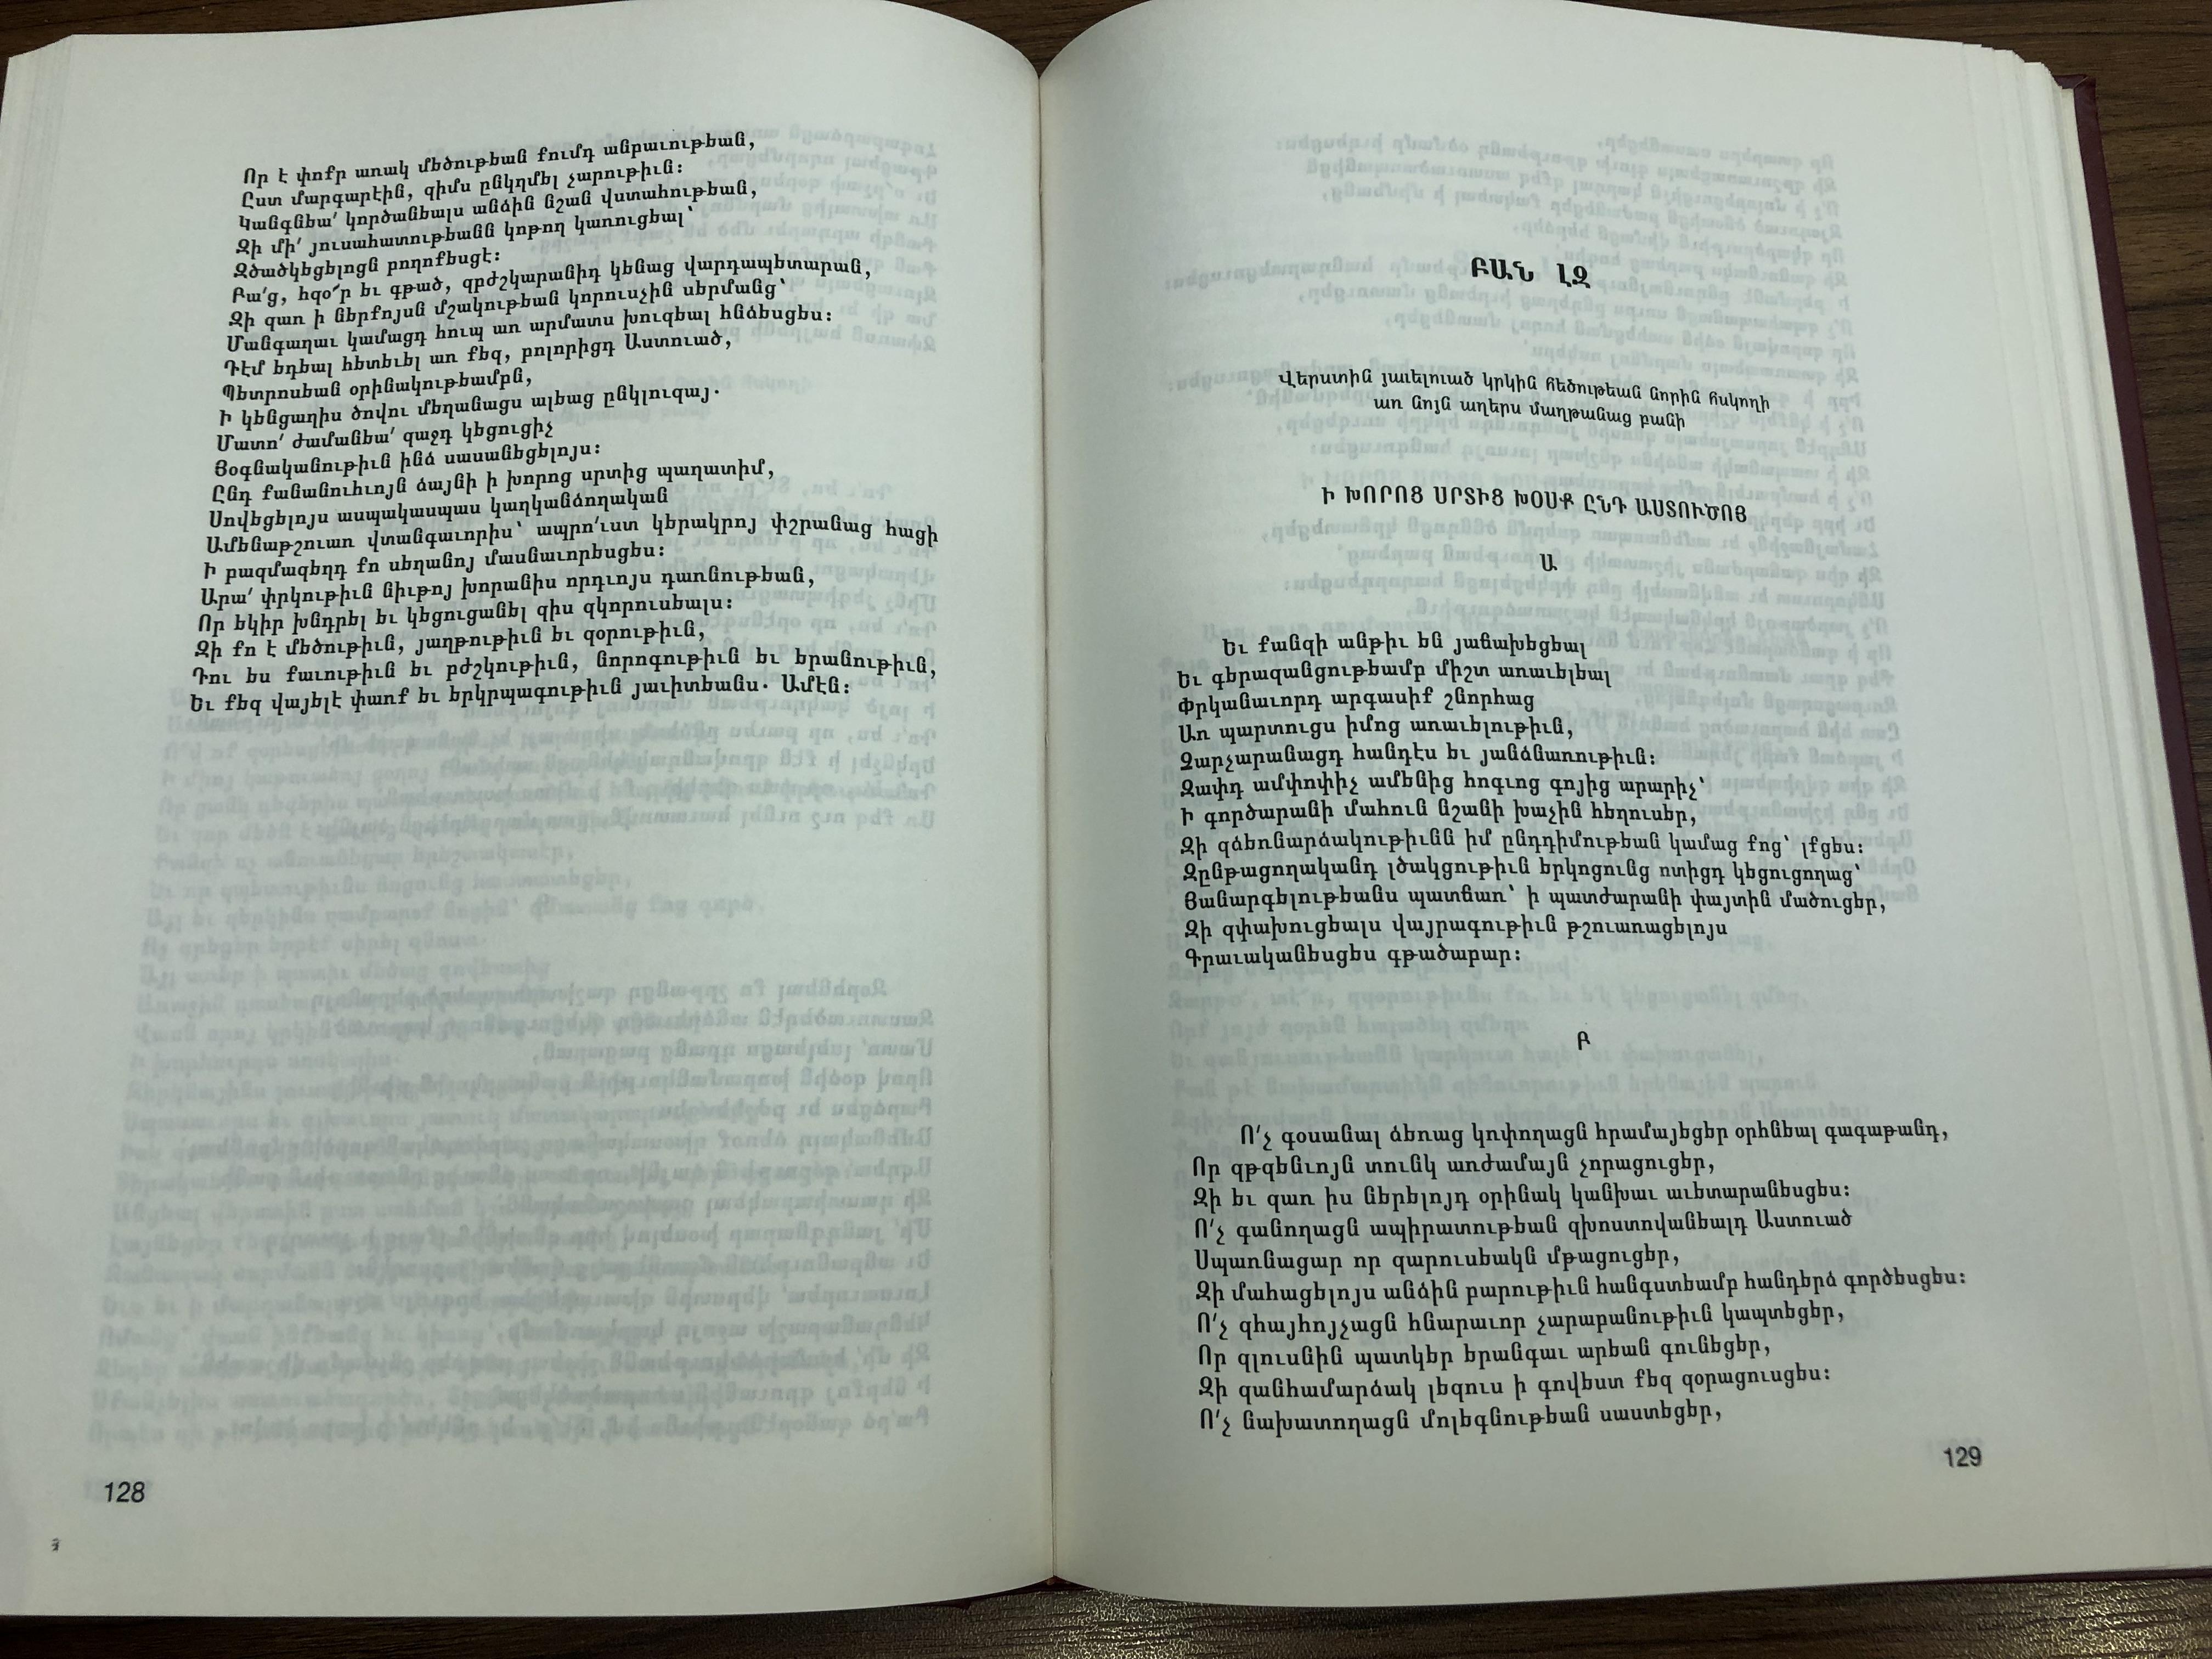 armenian-christian-prayer-book-daily-prayers-daily-devotionals-readings-hardcover-6-.jpg